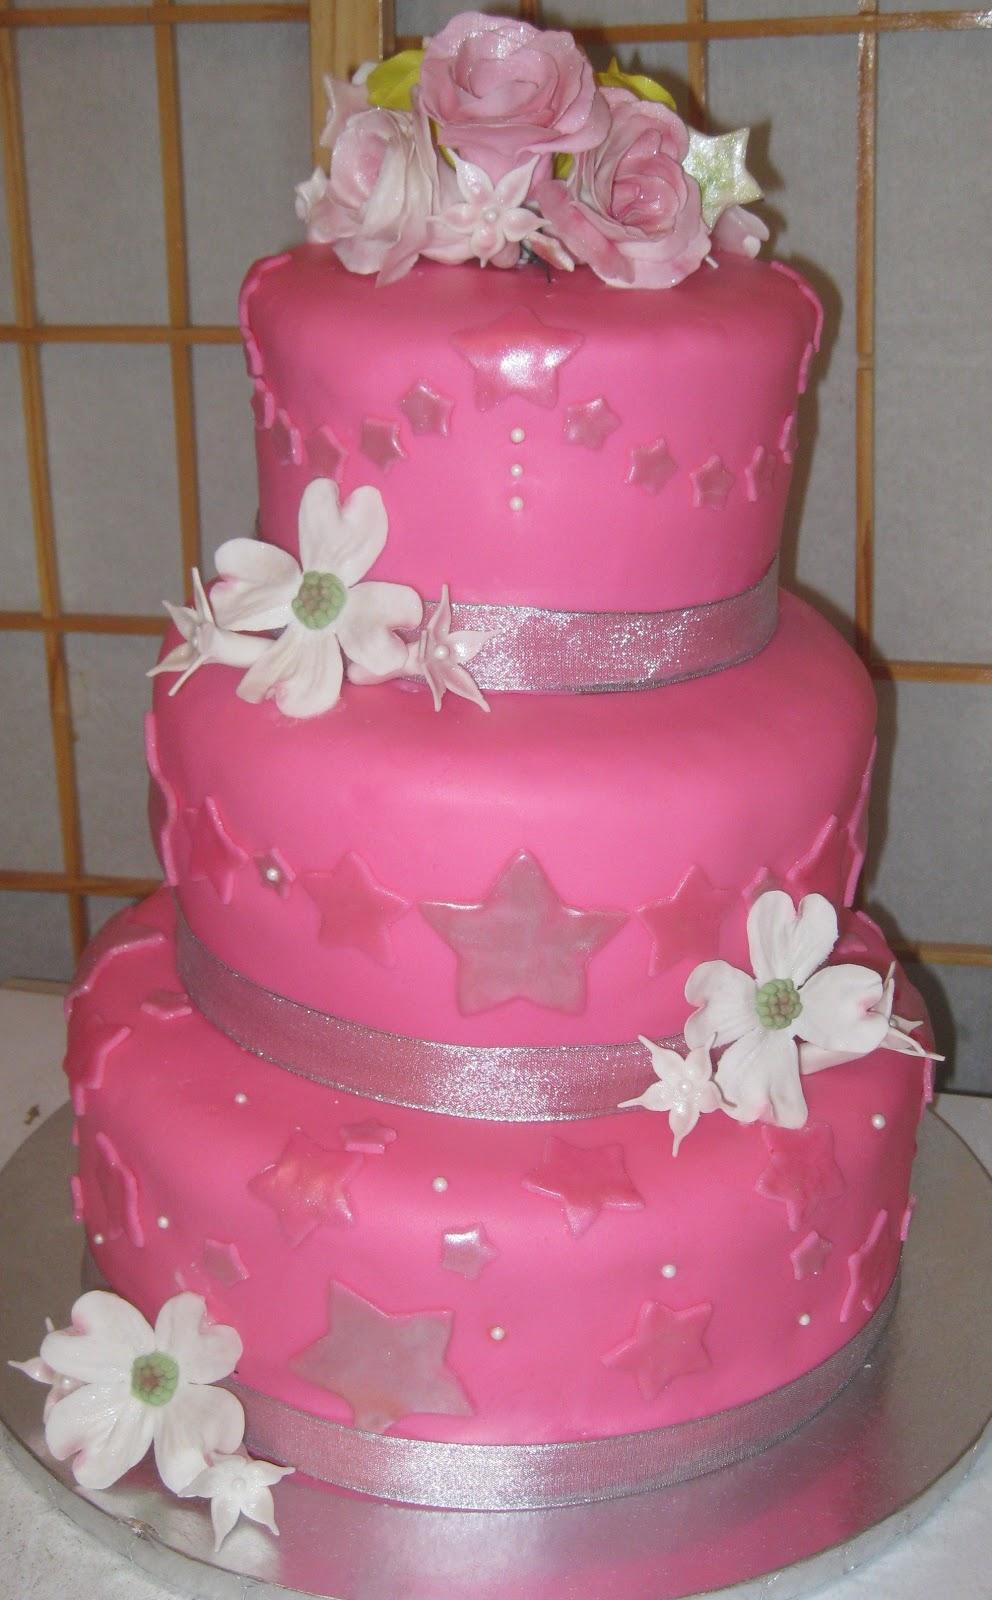 Fuzzy Cakes: Birthday cakes